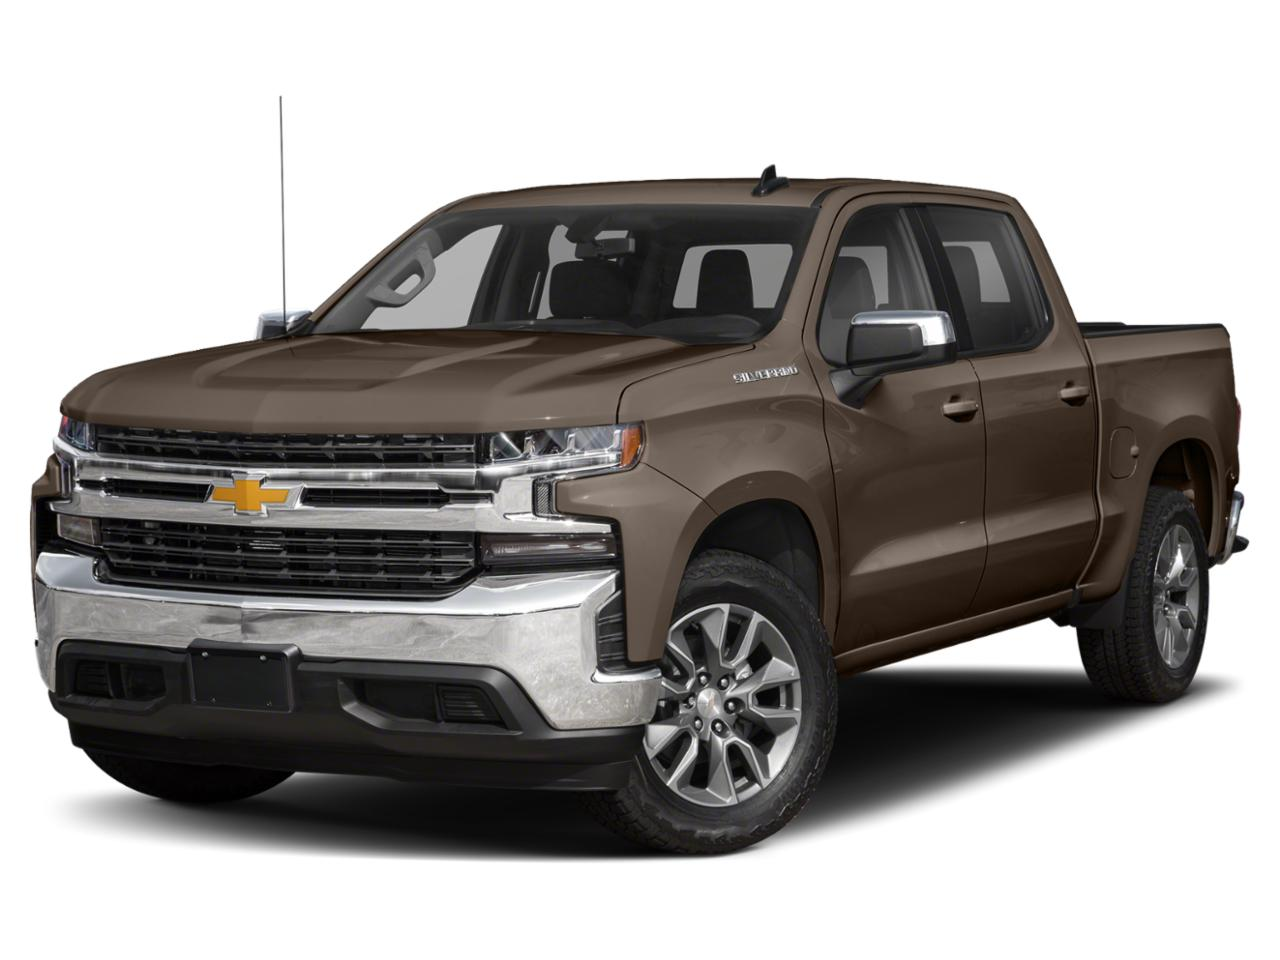 2019 Chevrolet Silverado 1500 Vehicle Photo in Odessa, TX 79762